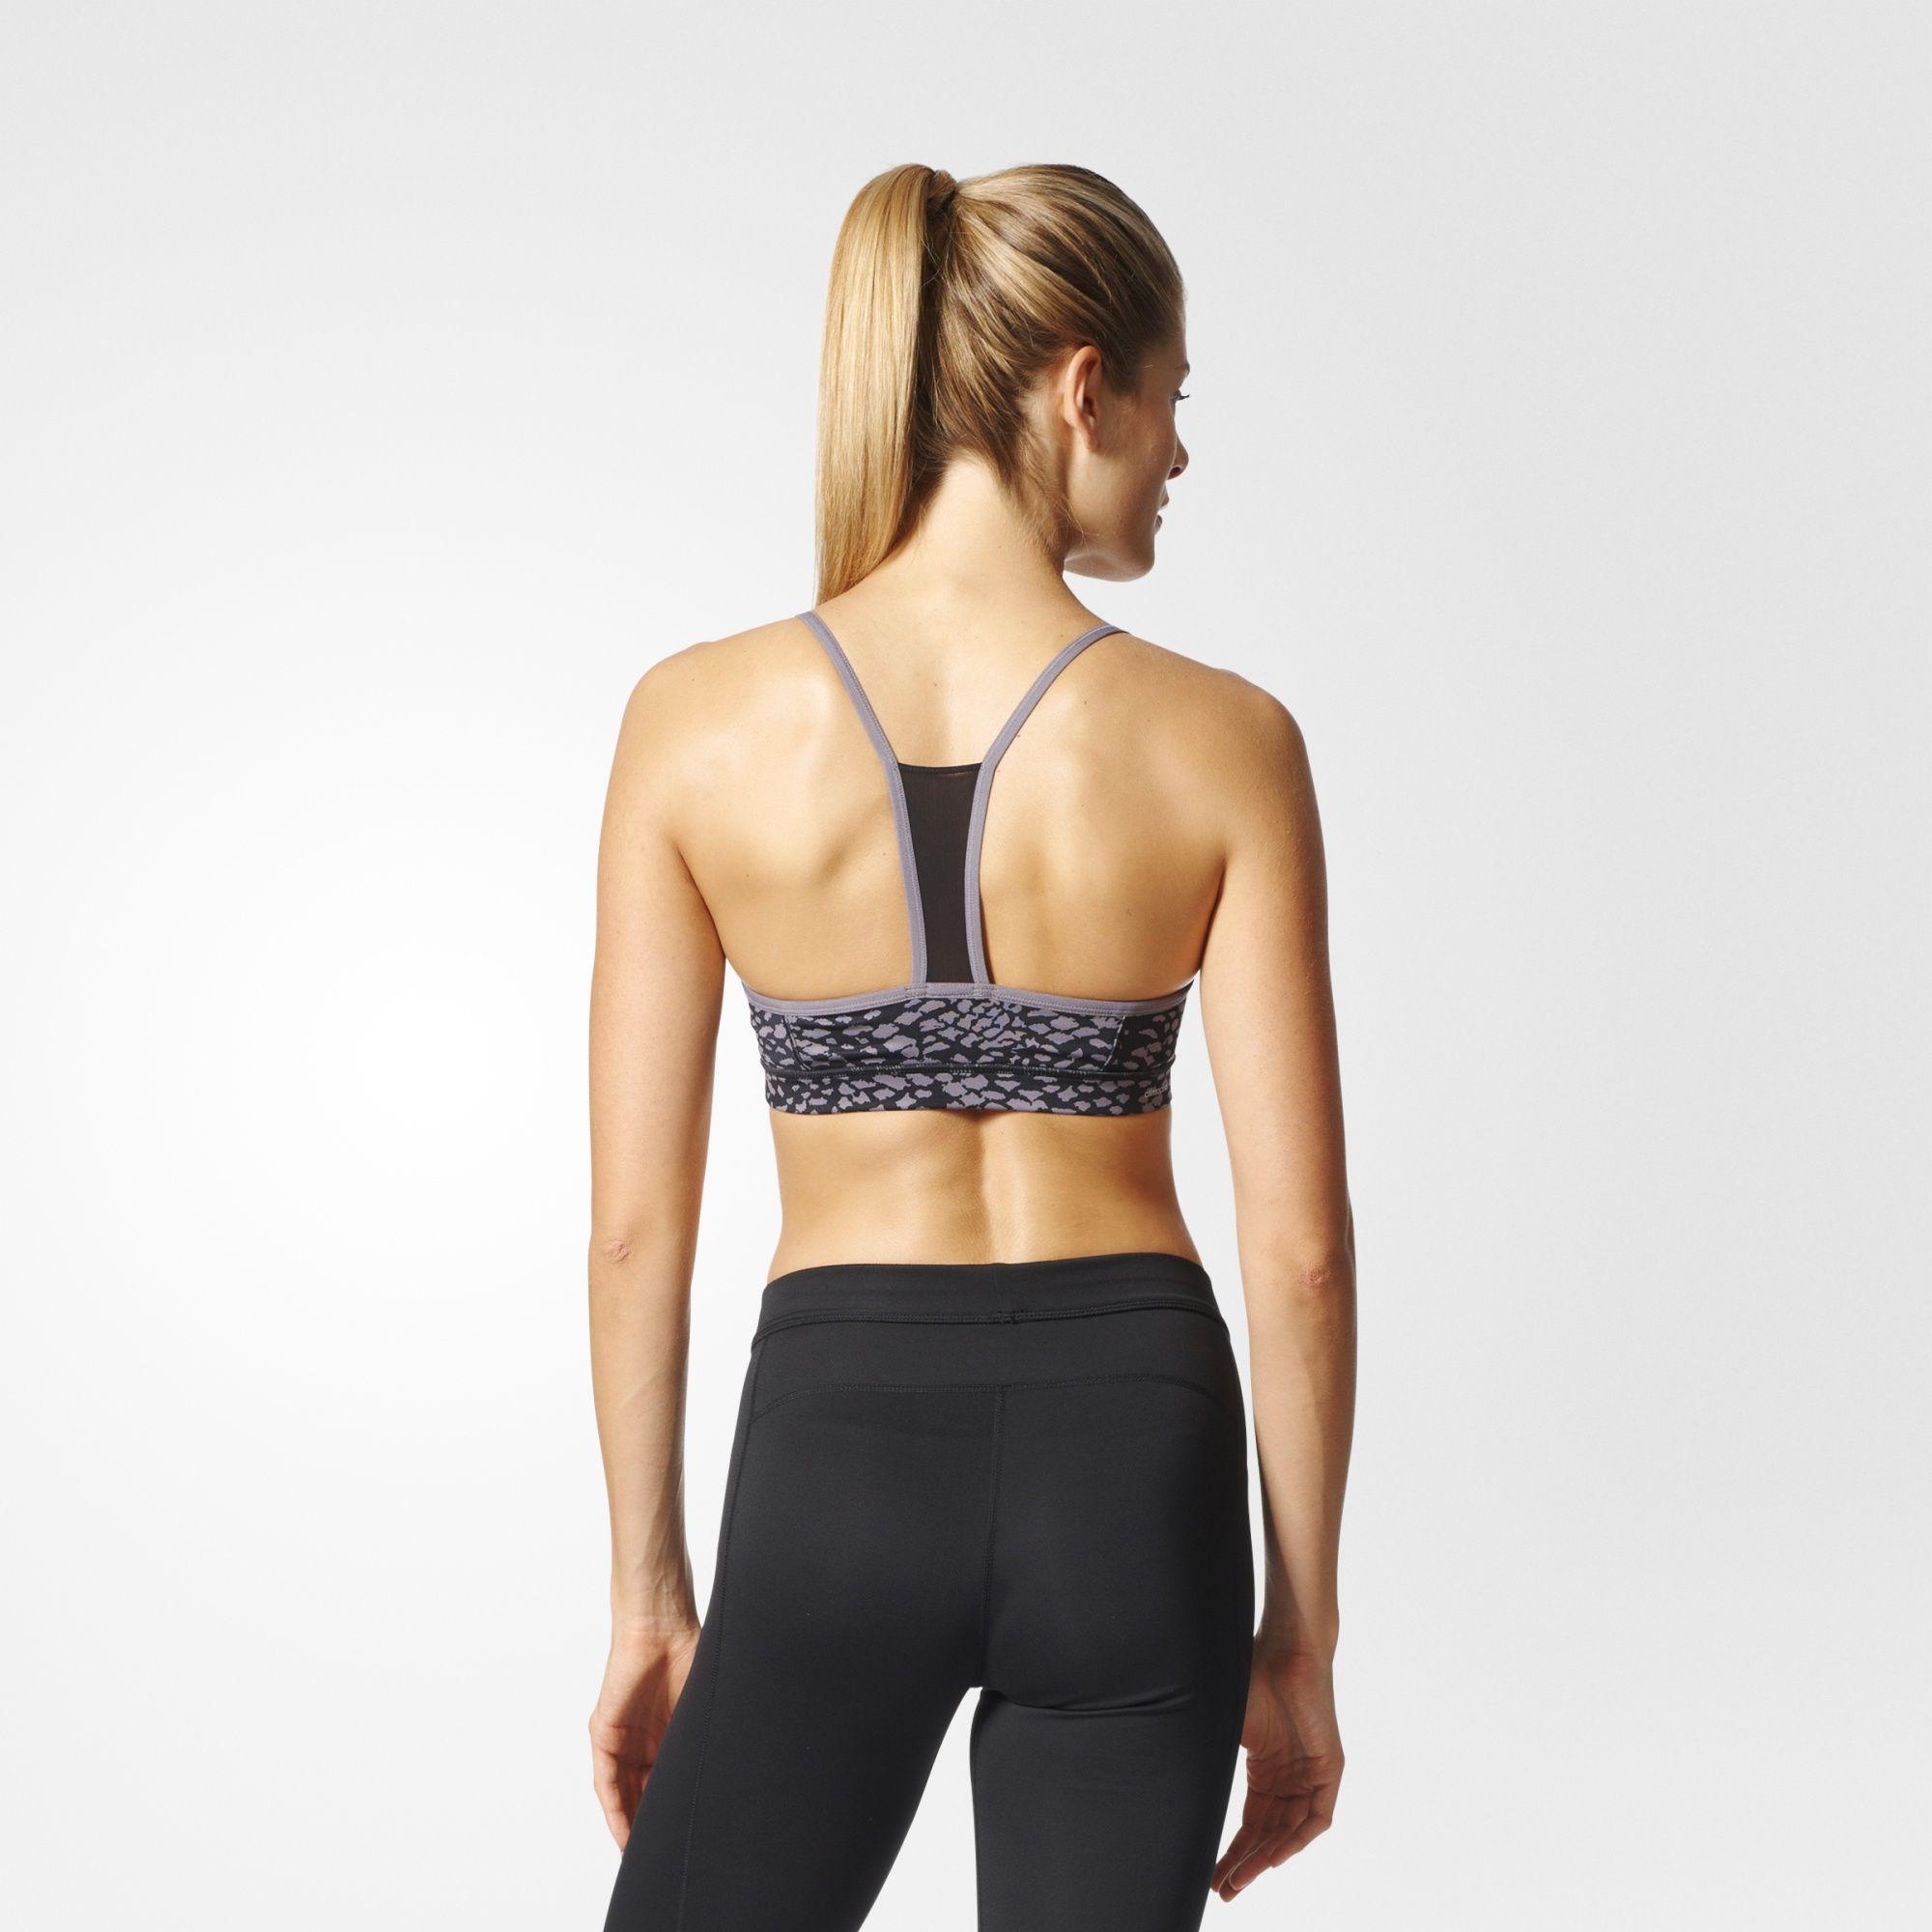 adidas, sko, joggesko, treningstøy treningsklær, aktiv, dame